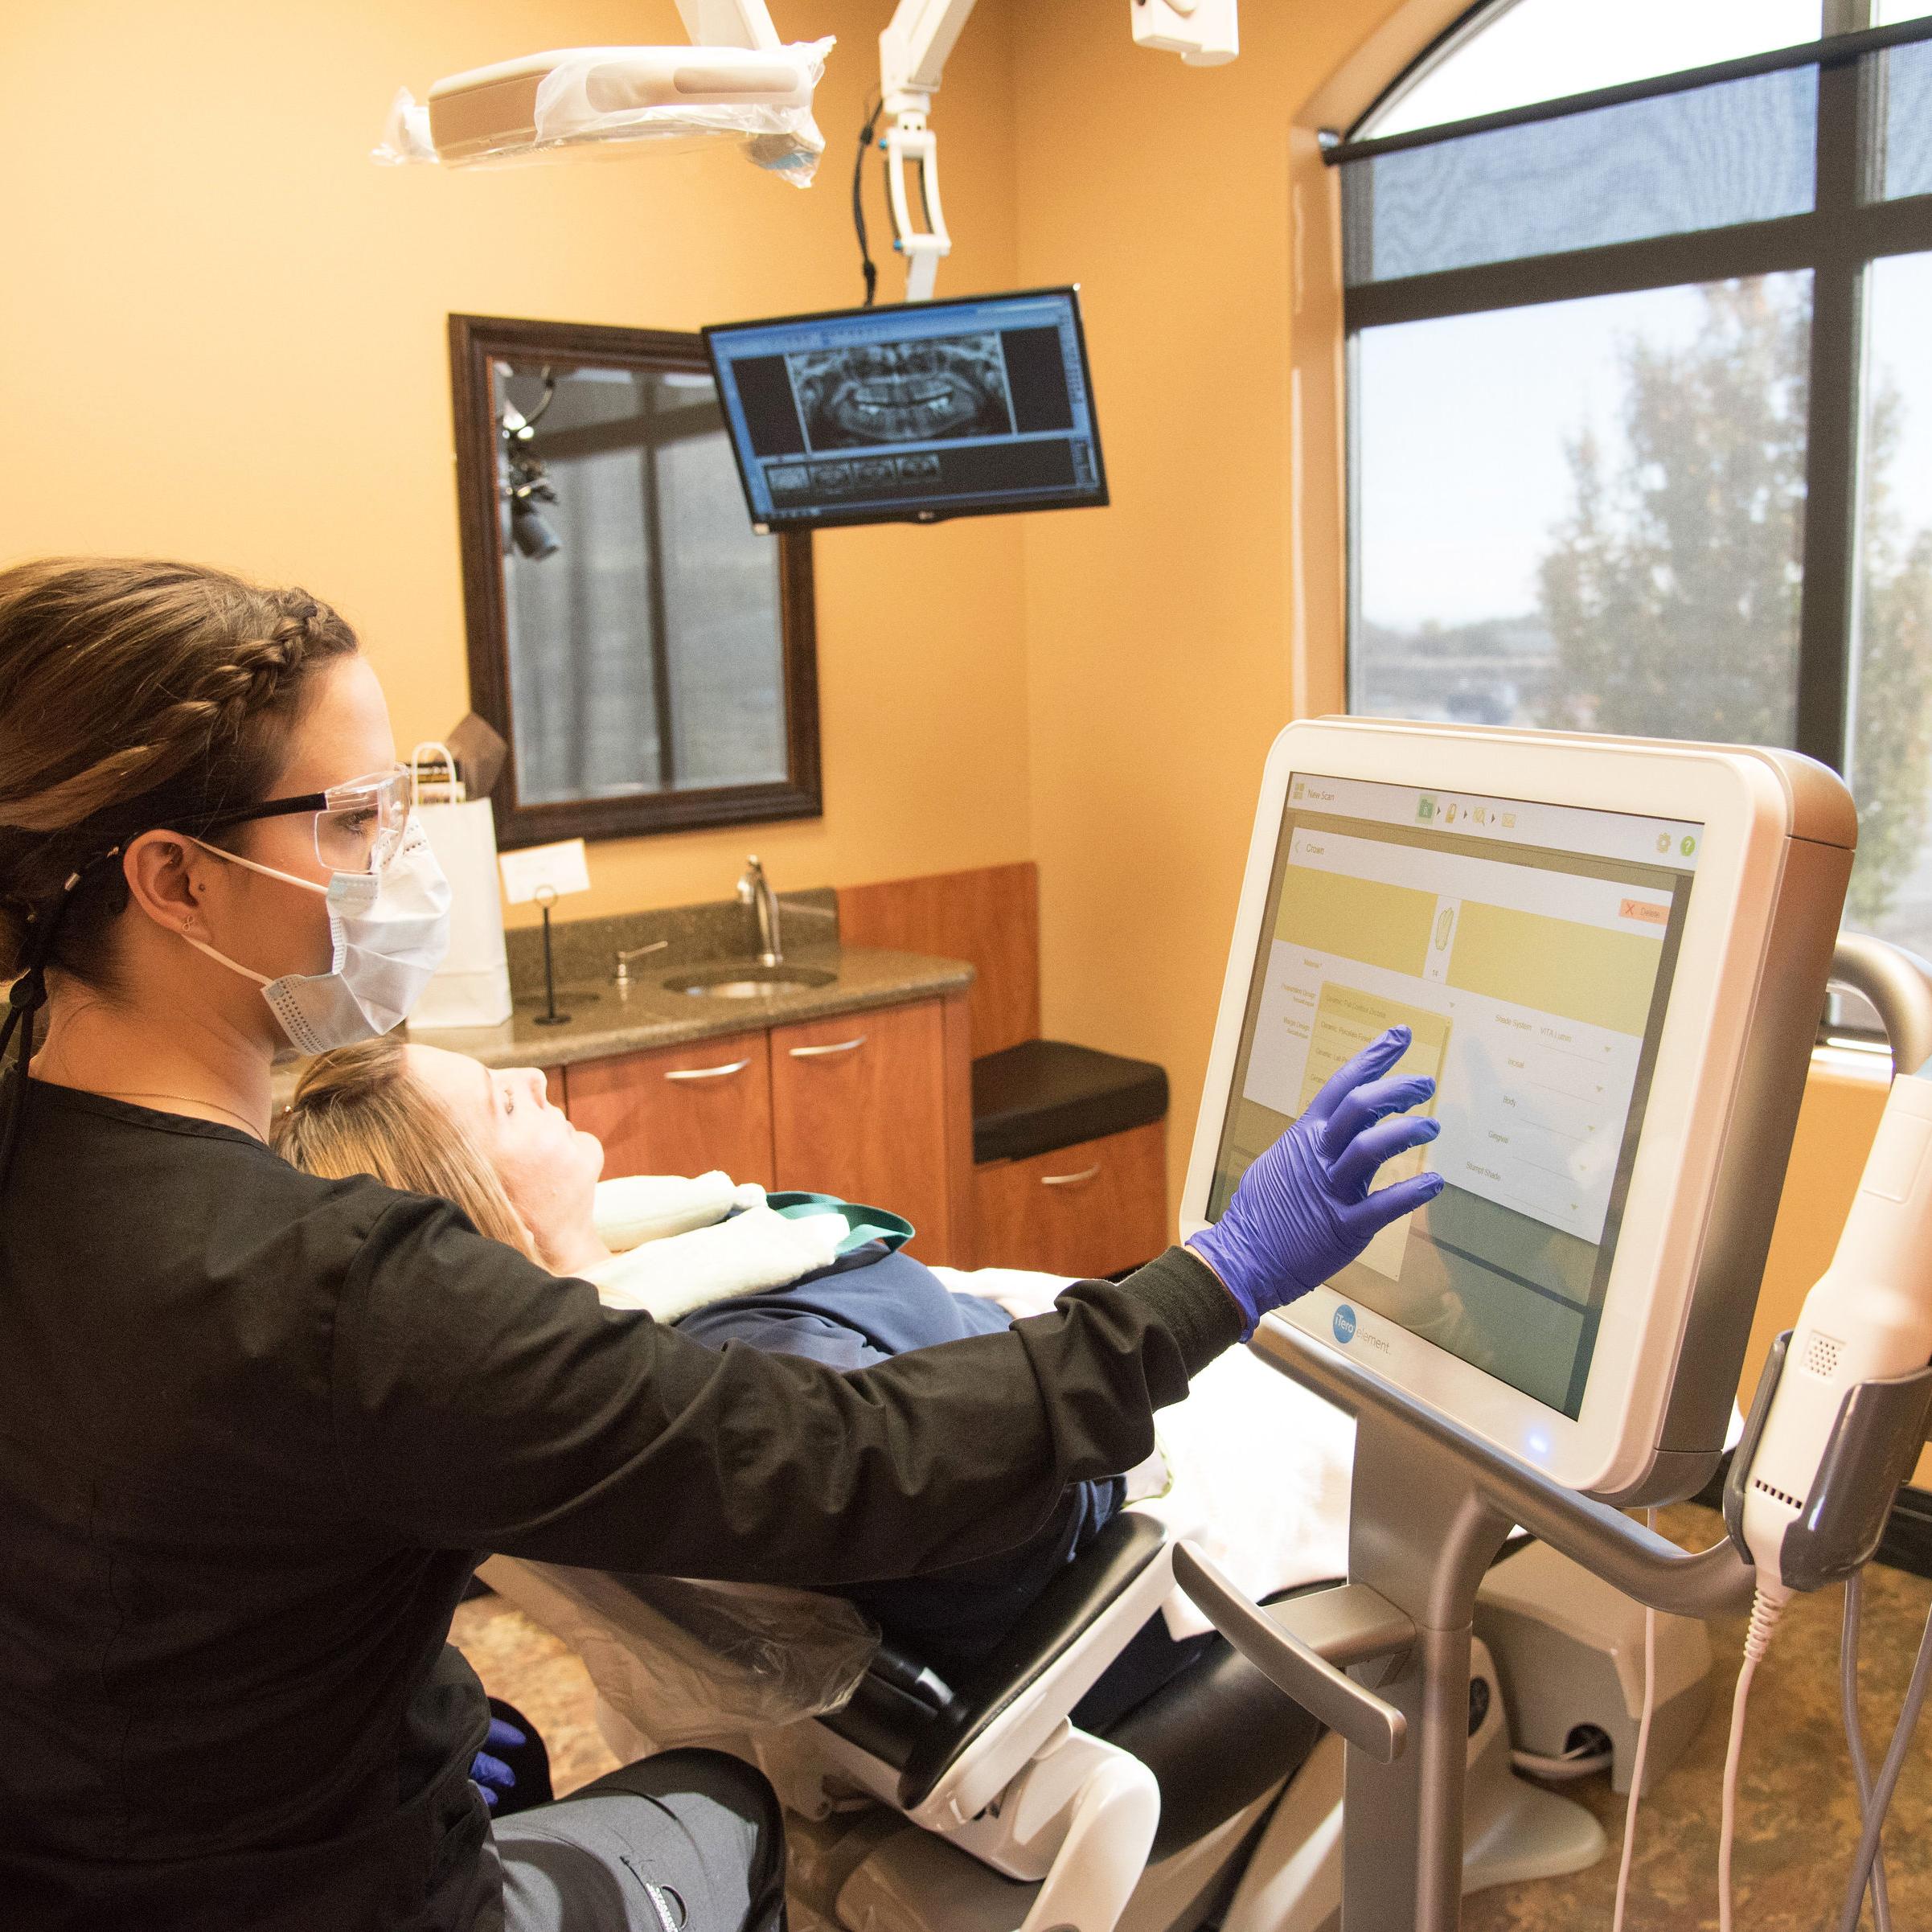 lifetime-dental-care-services-image.jpg